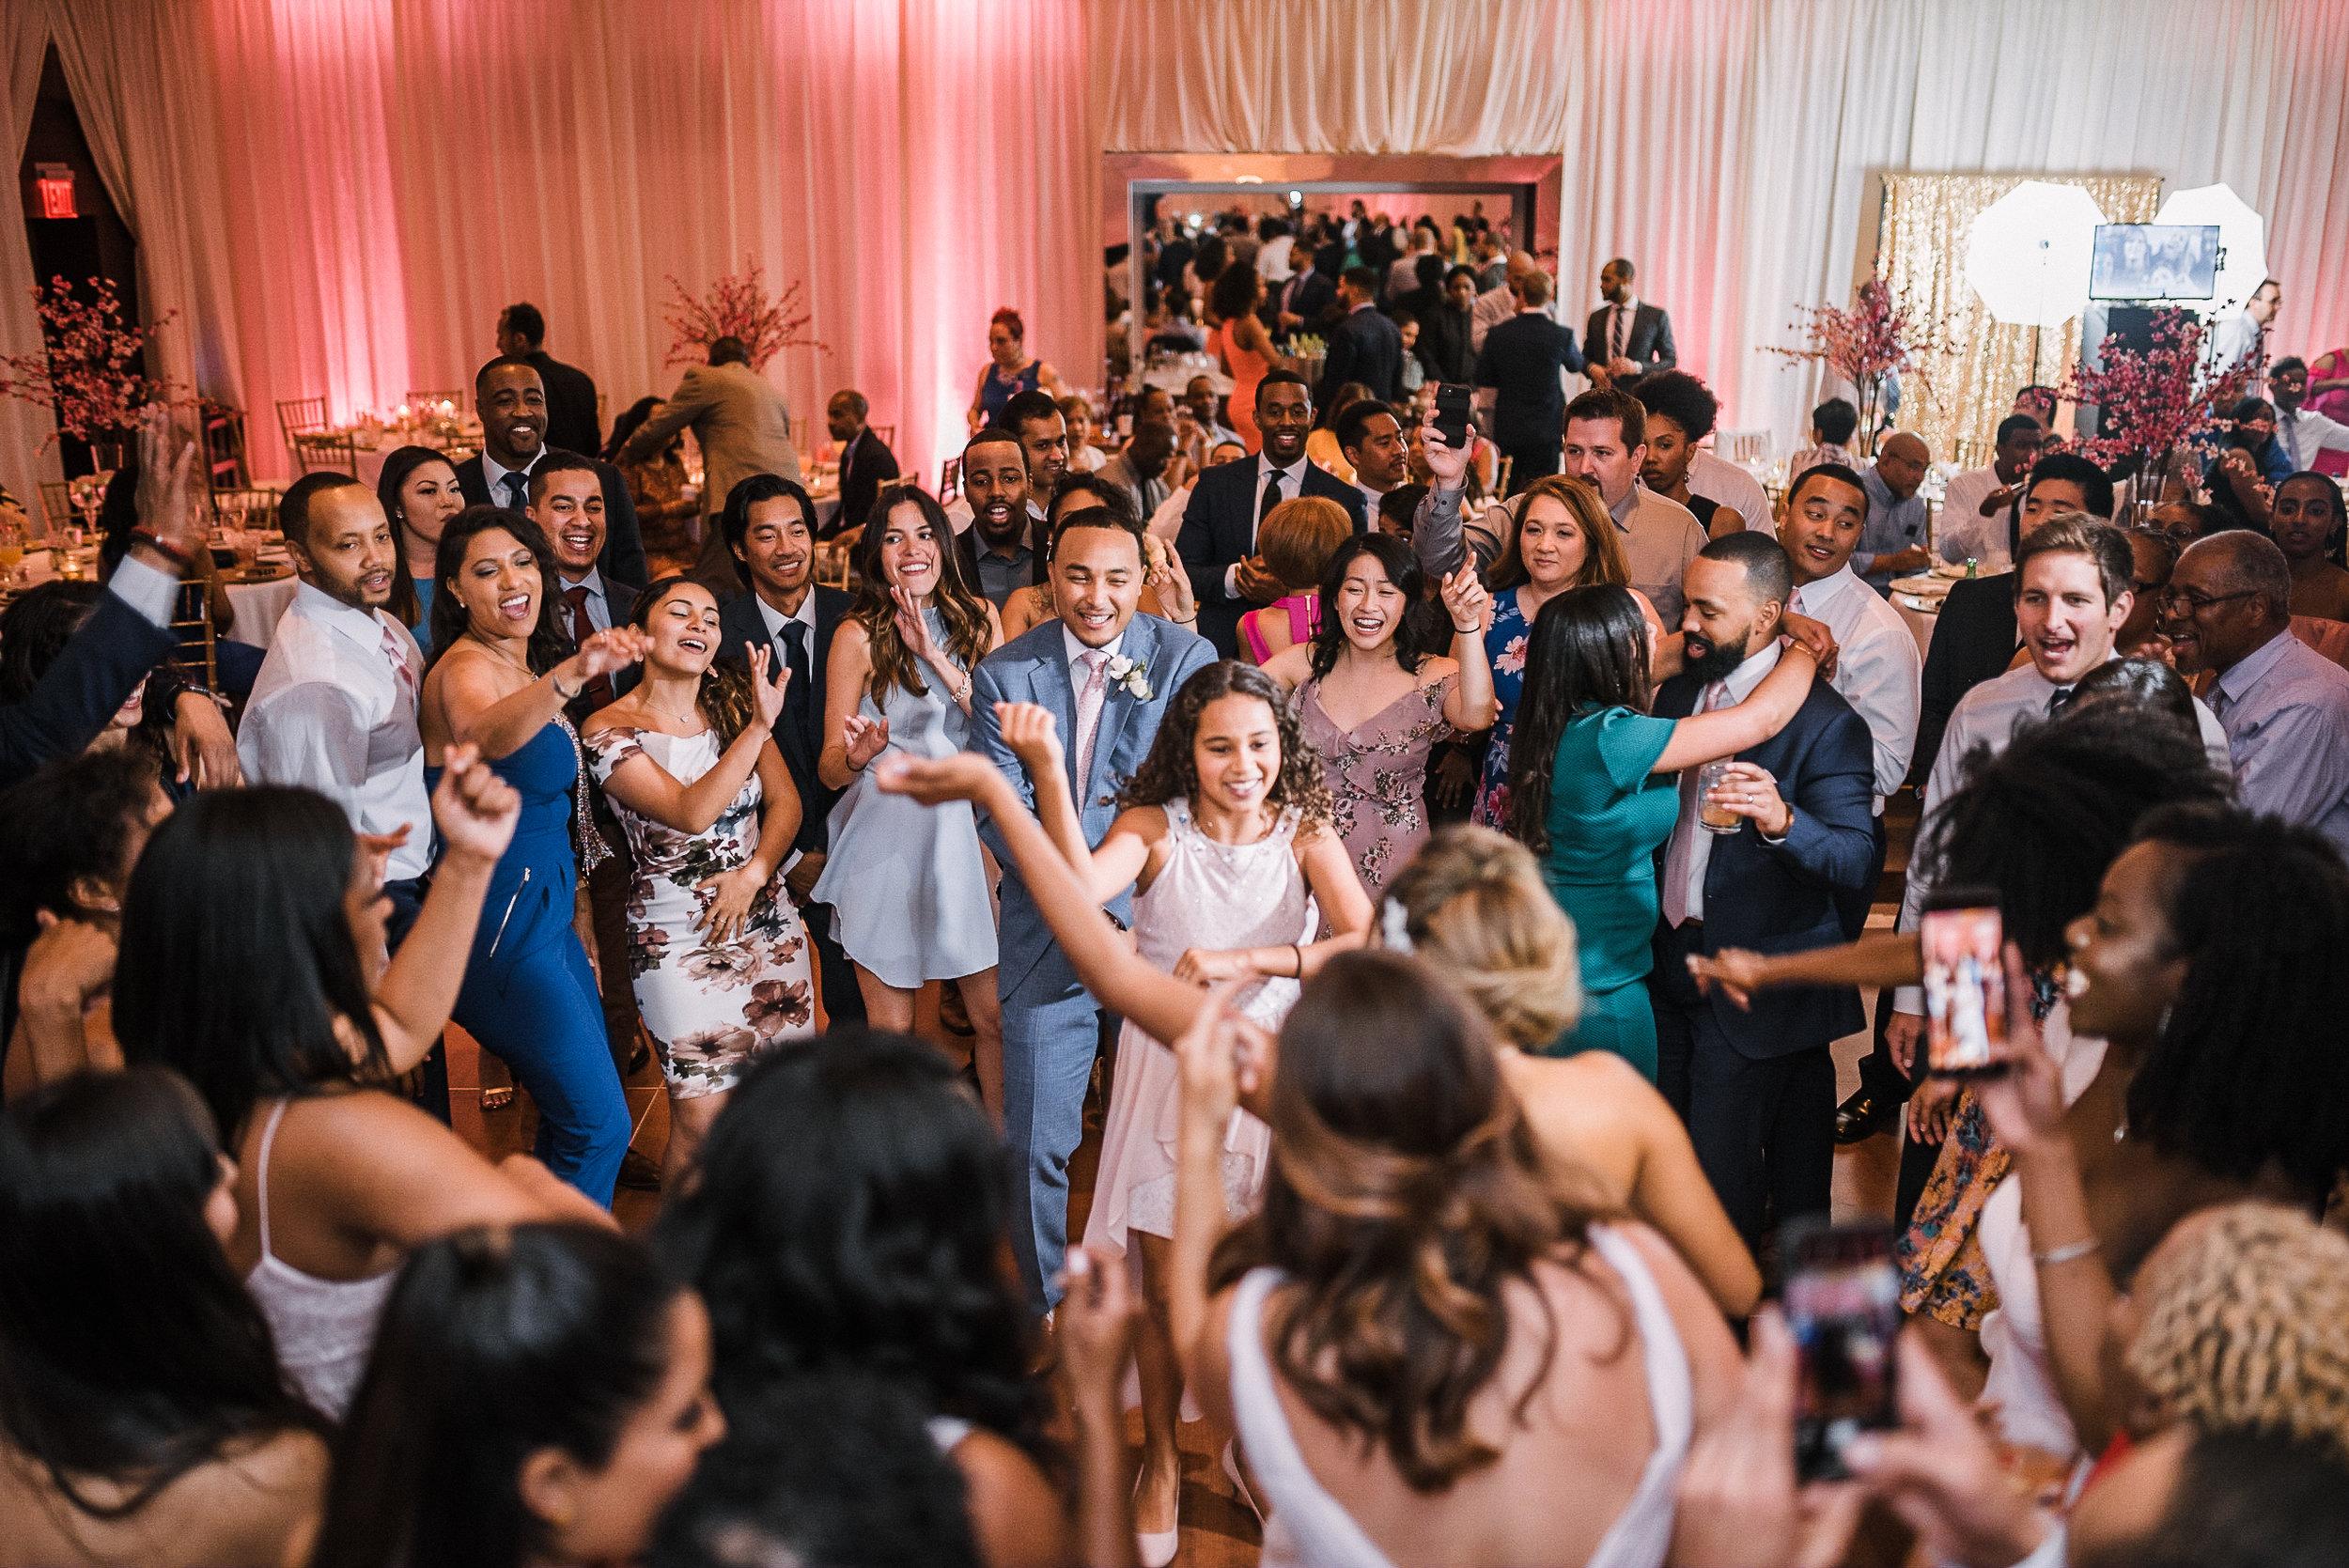 guests dancing at reception at The Park Hyatt Hotel in Washington DC